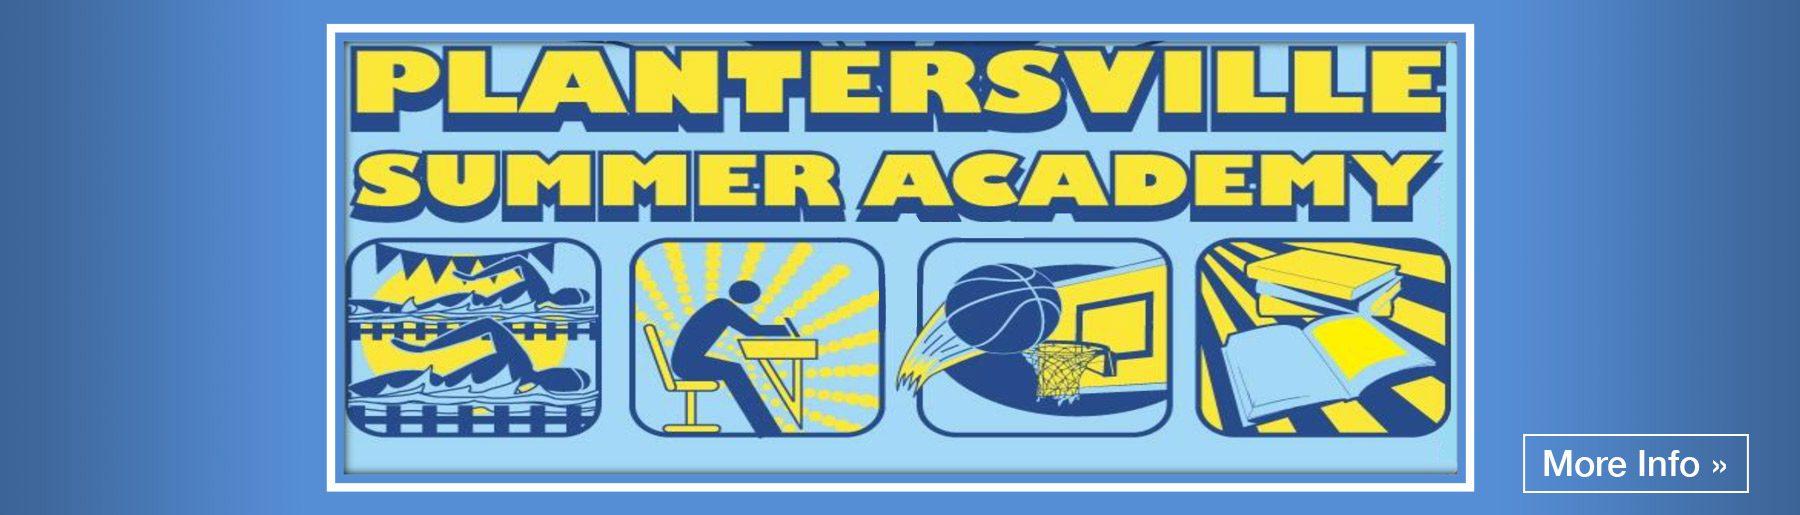 plantersville-summer-academy-2017-v2